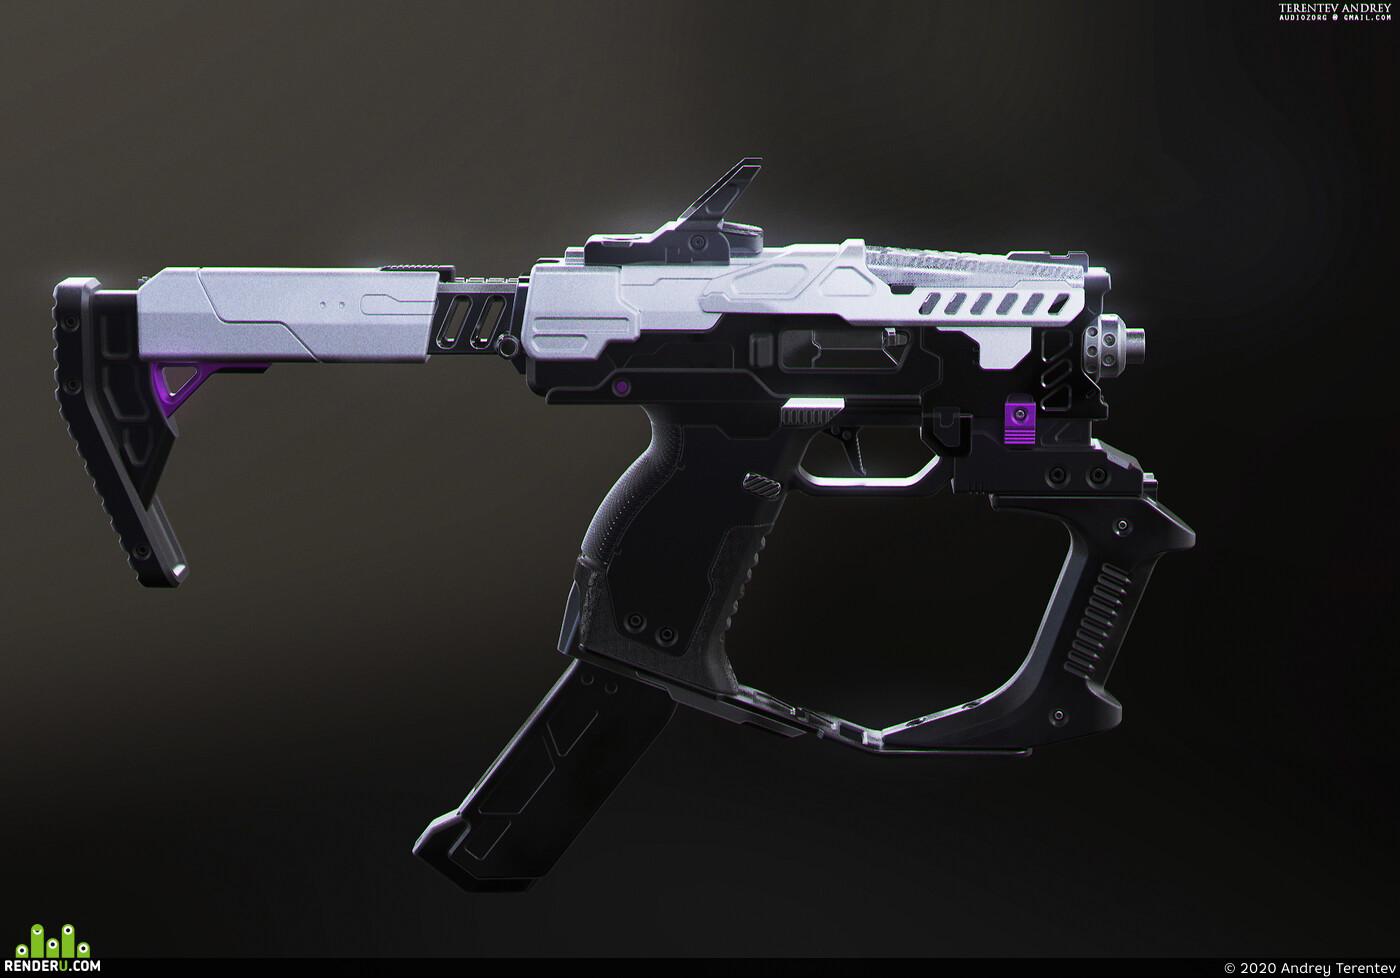 3d, guns, digital, digital3d, fusion360, design, pistol, hardsurface, weapon